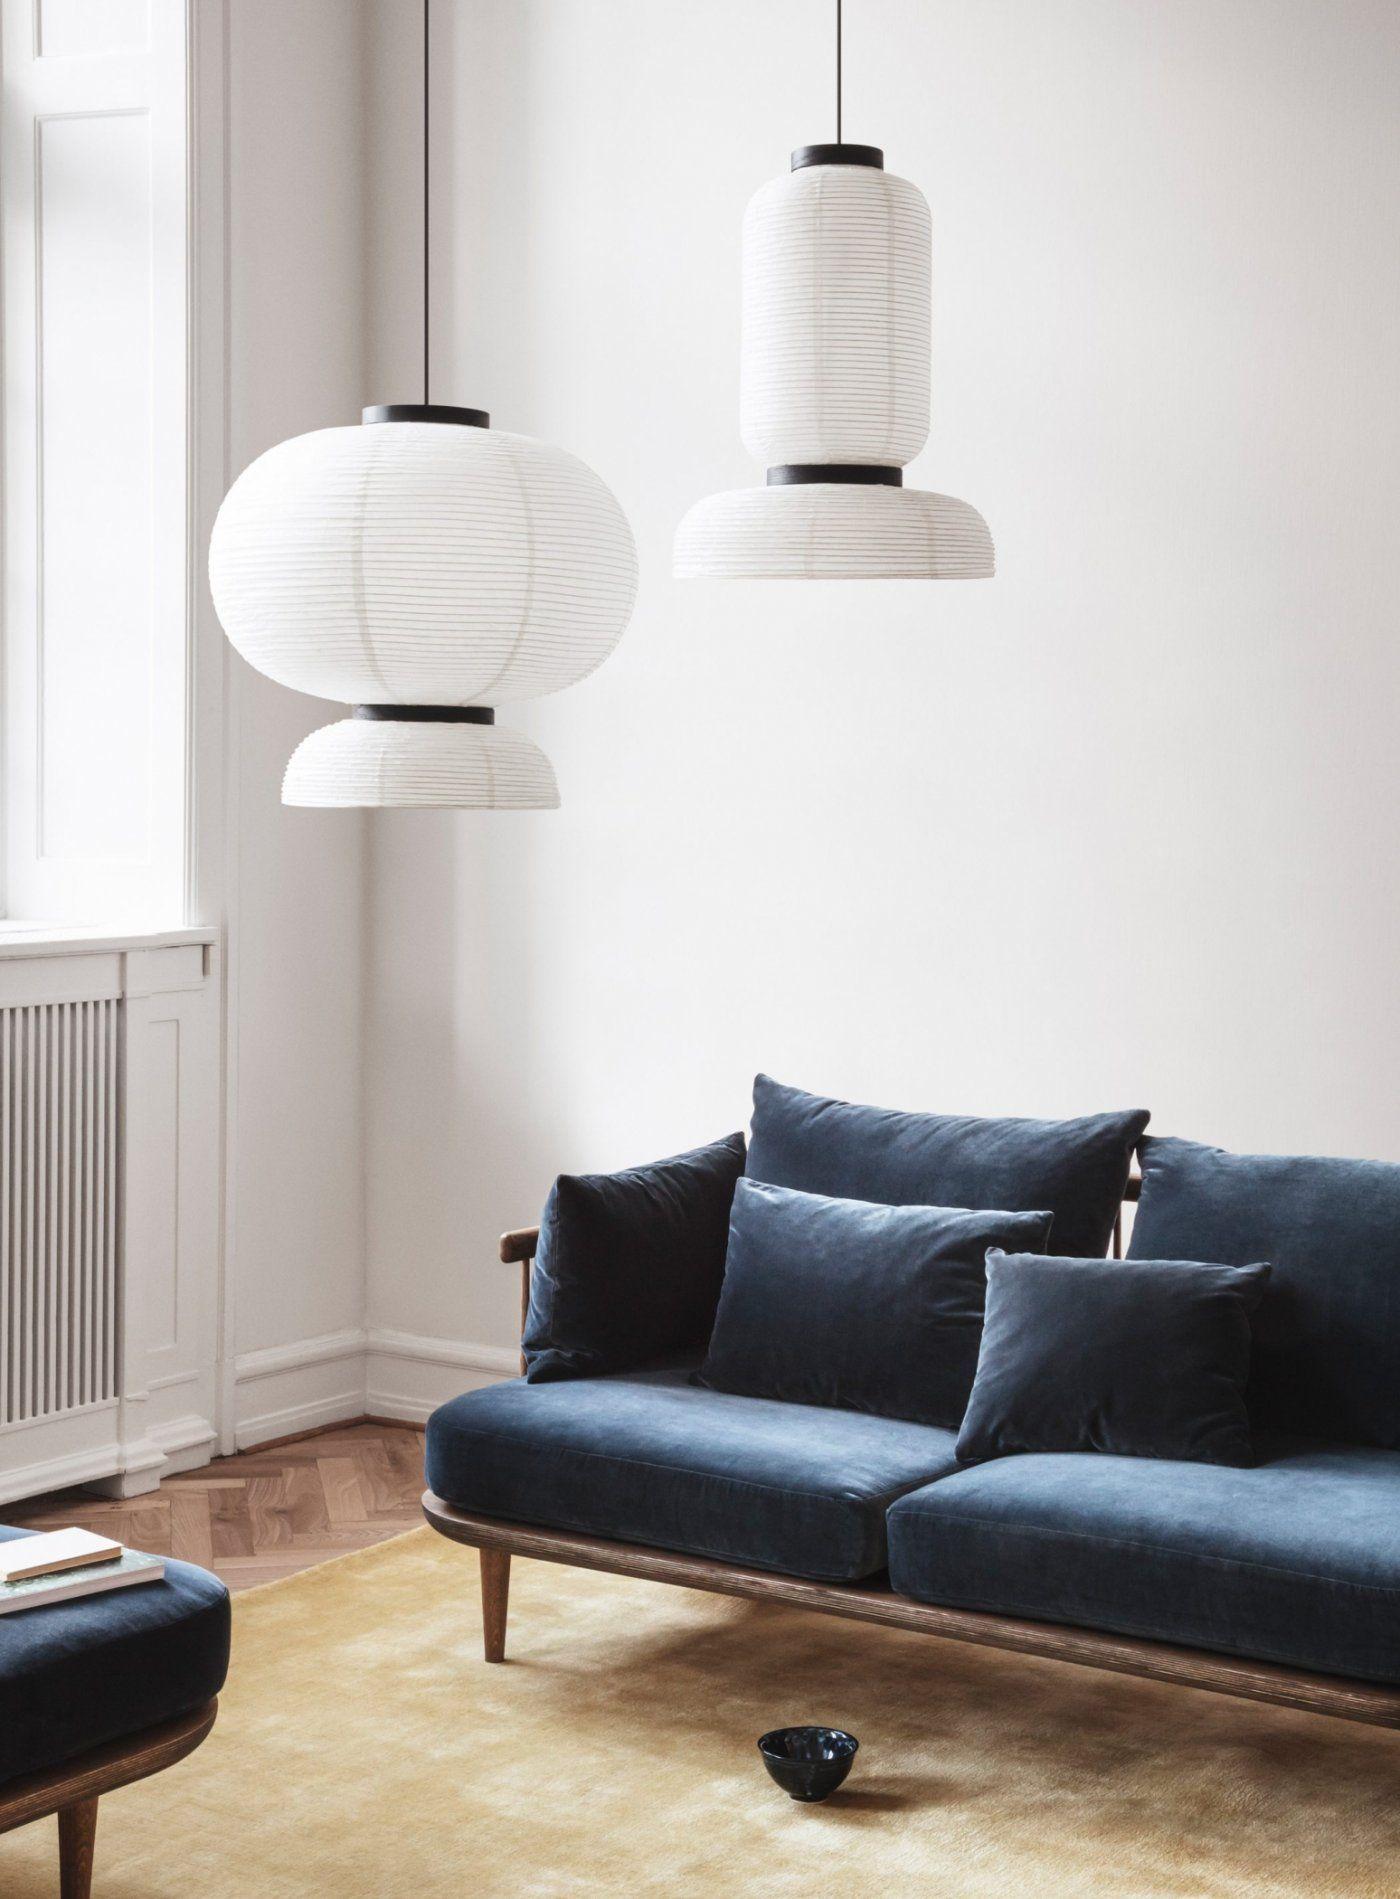 Tradition Formakami Jh3 Contemporary Lighting Design Interior Pendant Lamp Design